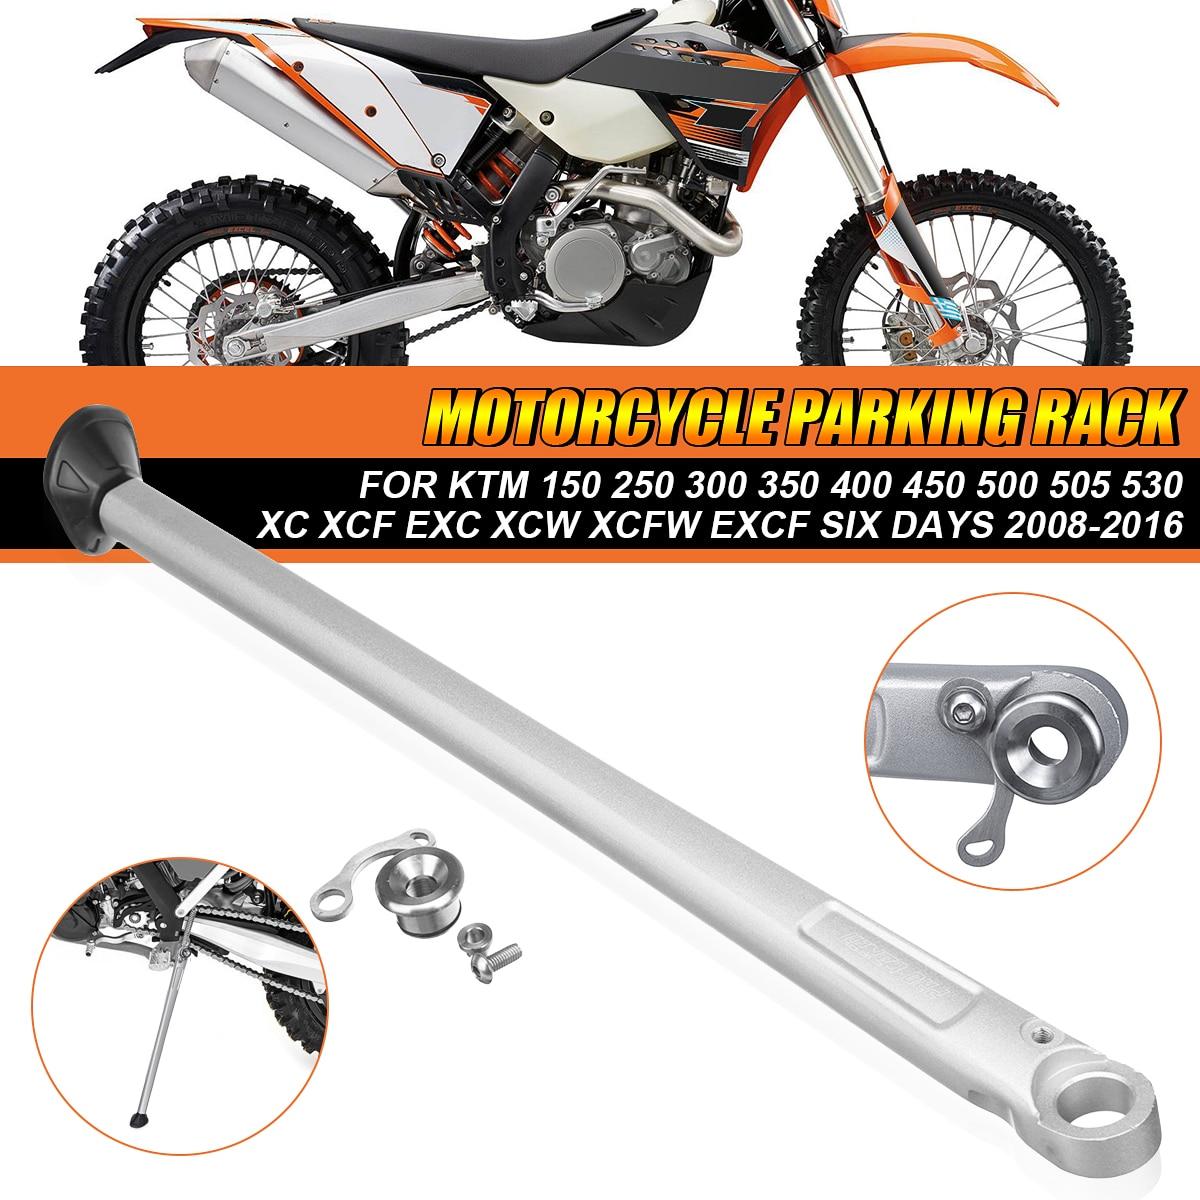 Motorcycle Parking Rack Side Kick Stand Kickstand For KTM For HUSABERG For HUSQVARNA 150 250 300 350 400 450 500 505 530 XC XCF